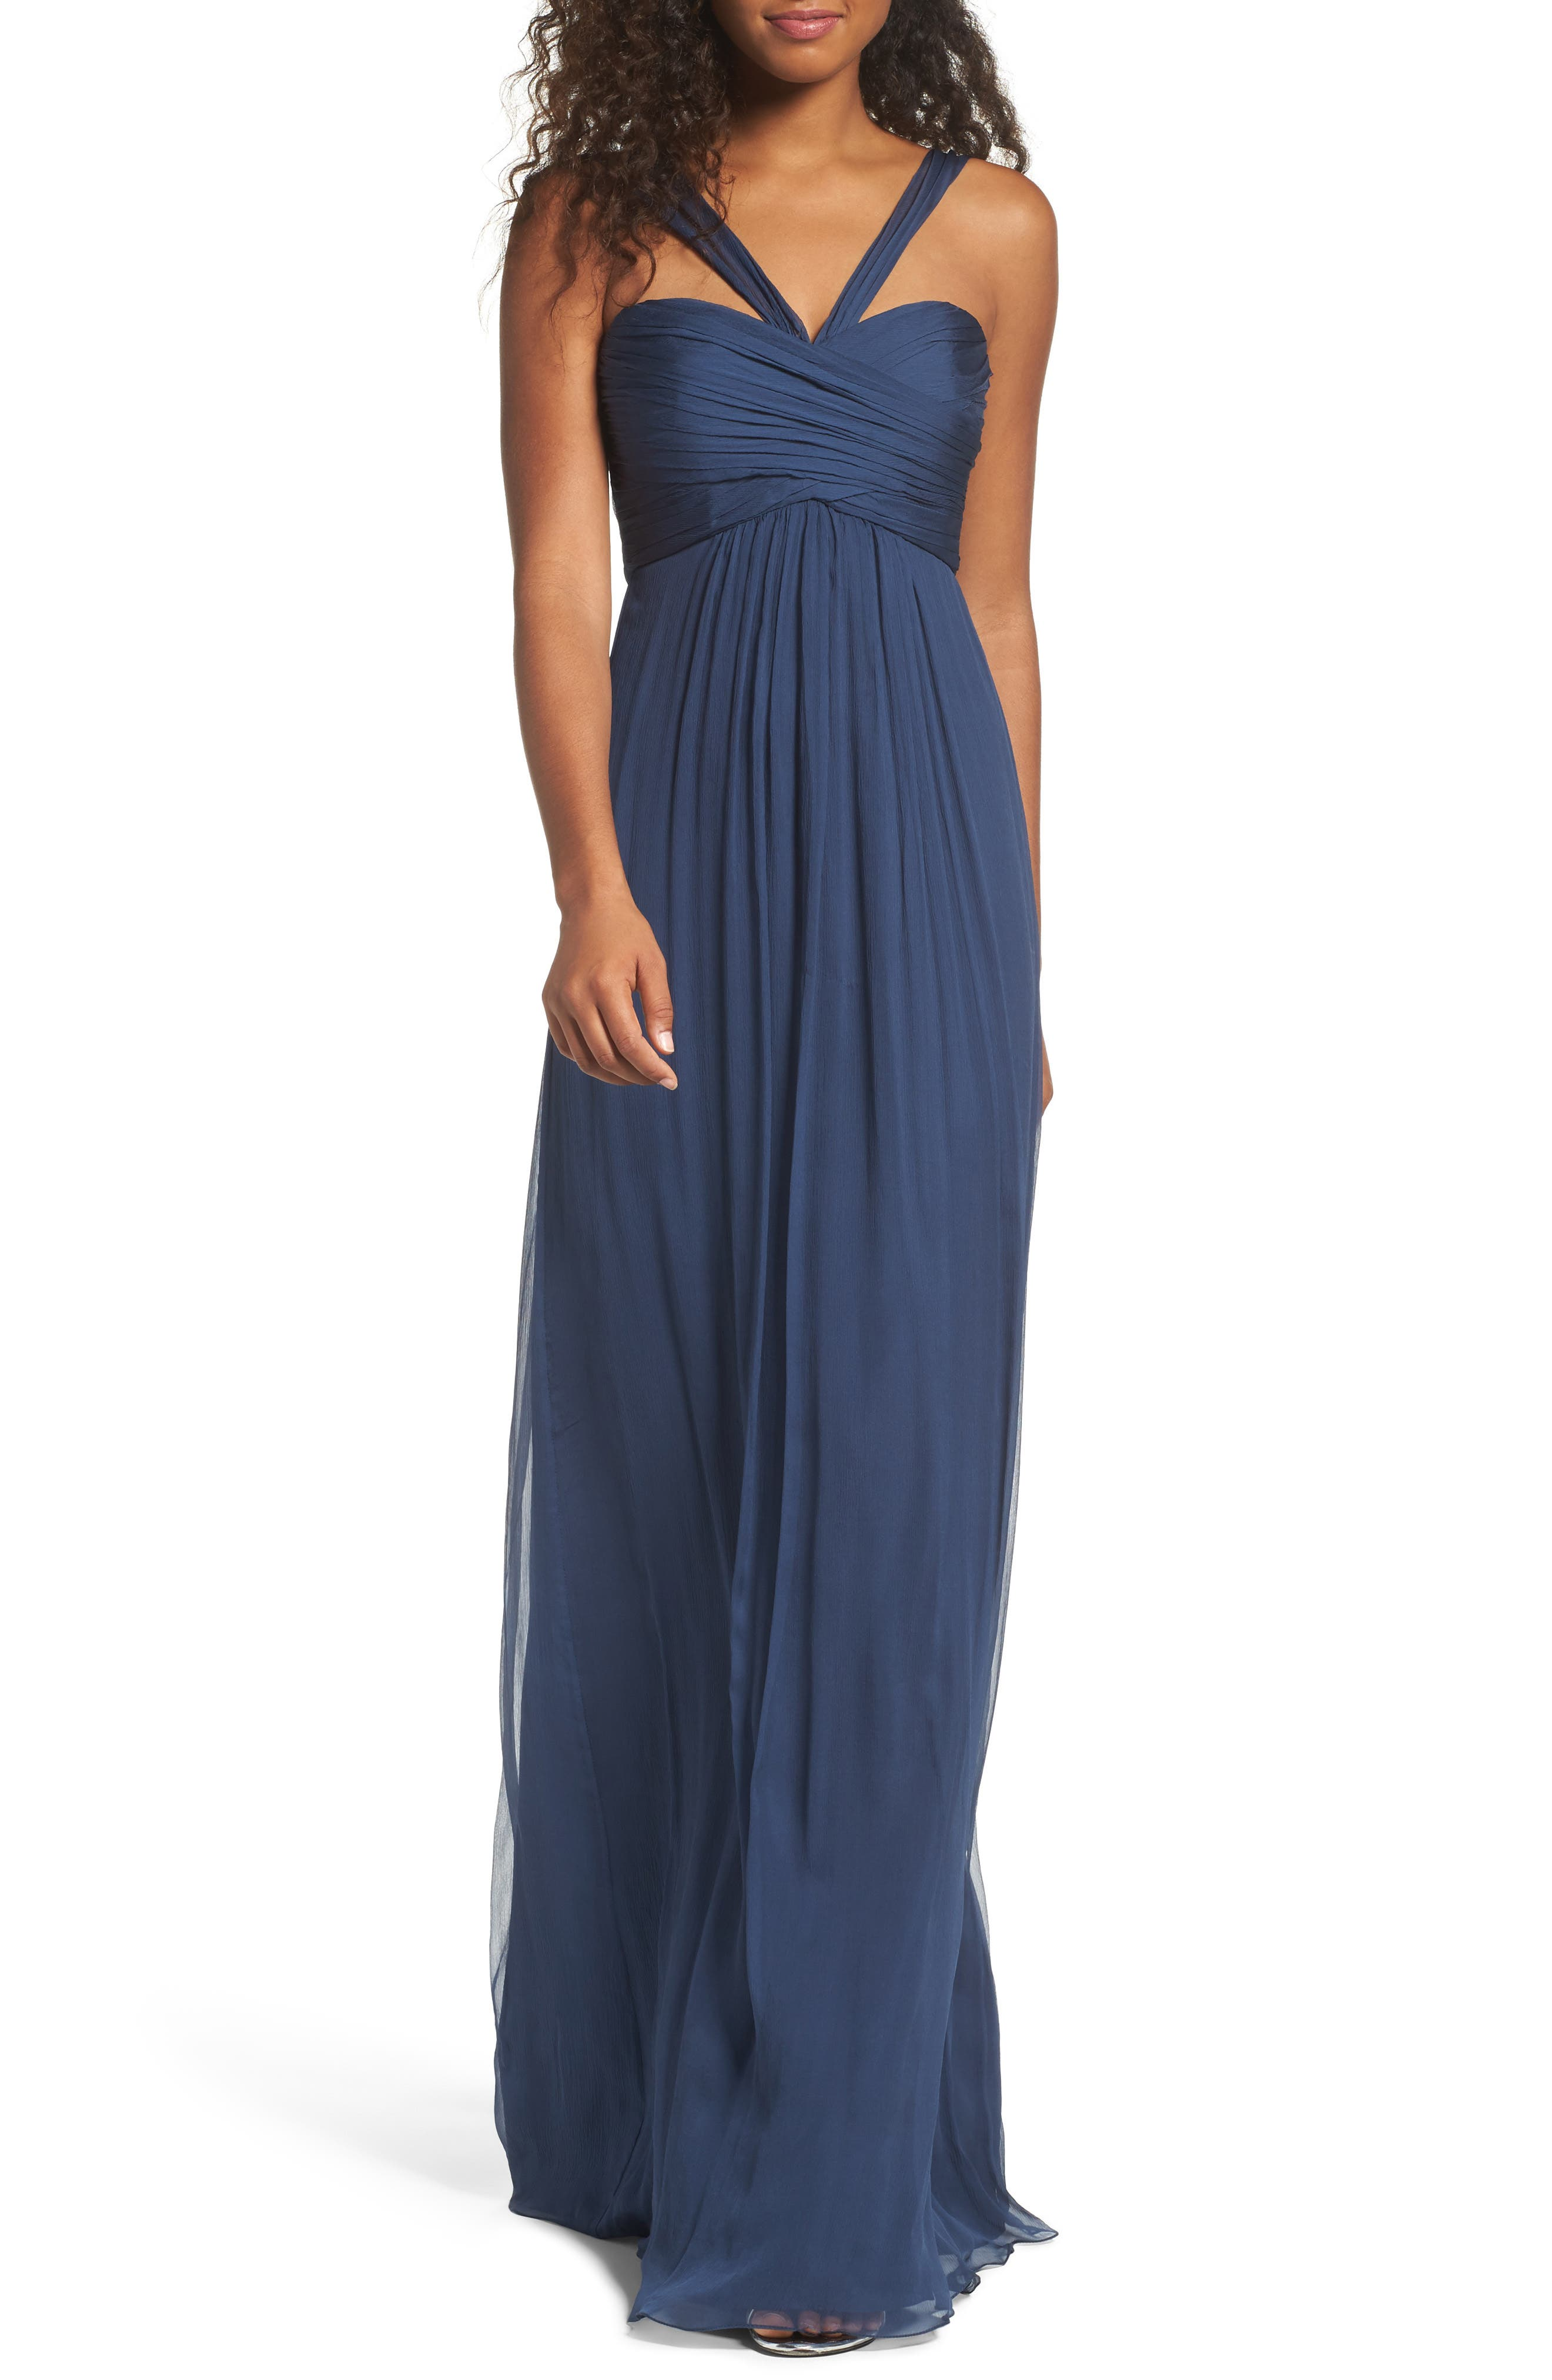 Main Image - Amsale Corbin Crinkled Chiffon Empire Gown